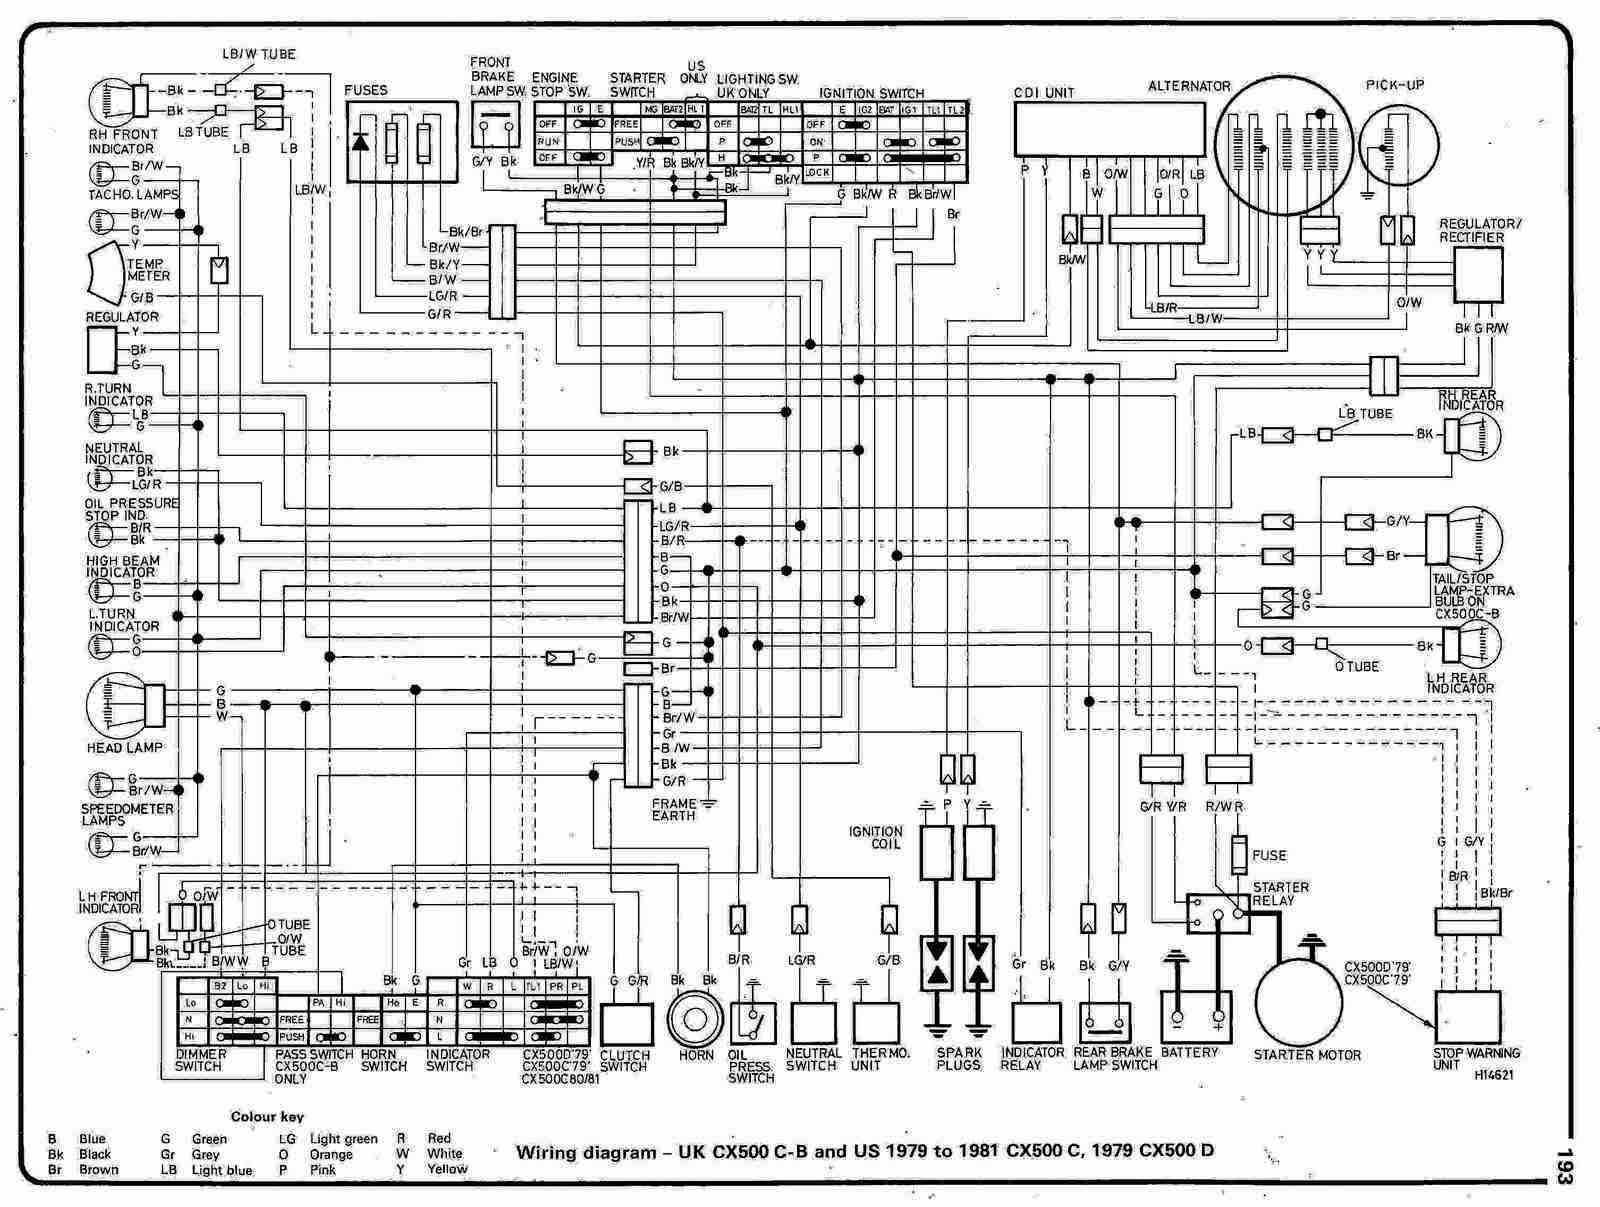 daewoo cielo wiring diagram data wiring diagramwiring diagram for daewoo  cielo wiring diagram pdf daewoo cielo